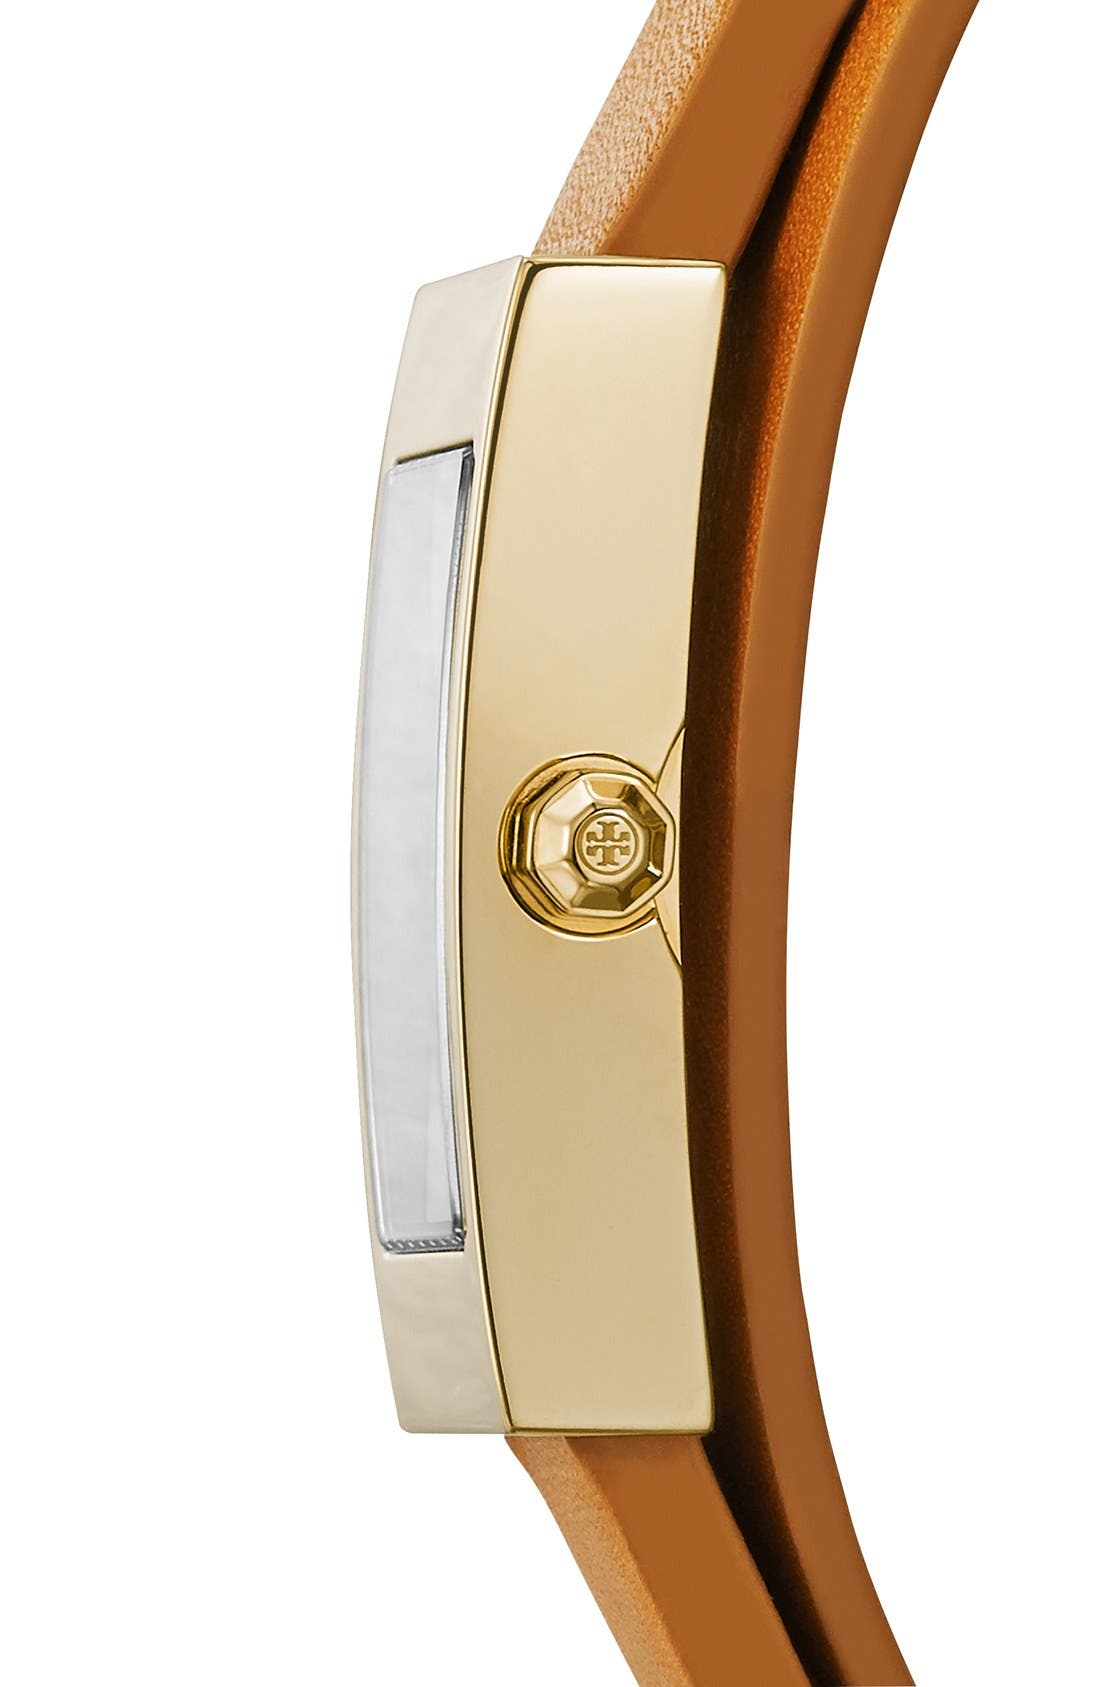 Alternate Image 3  - Tory Burch 'Buddy Signature' Rectangular Wrap Leather Strap Watch, 17mm x 31mm